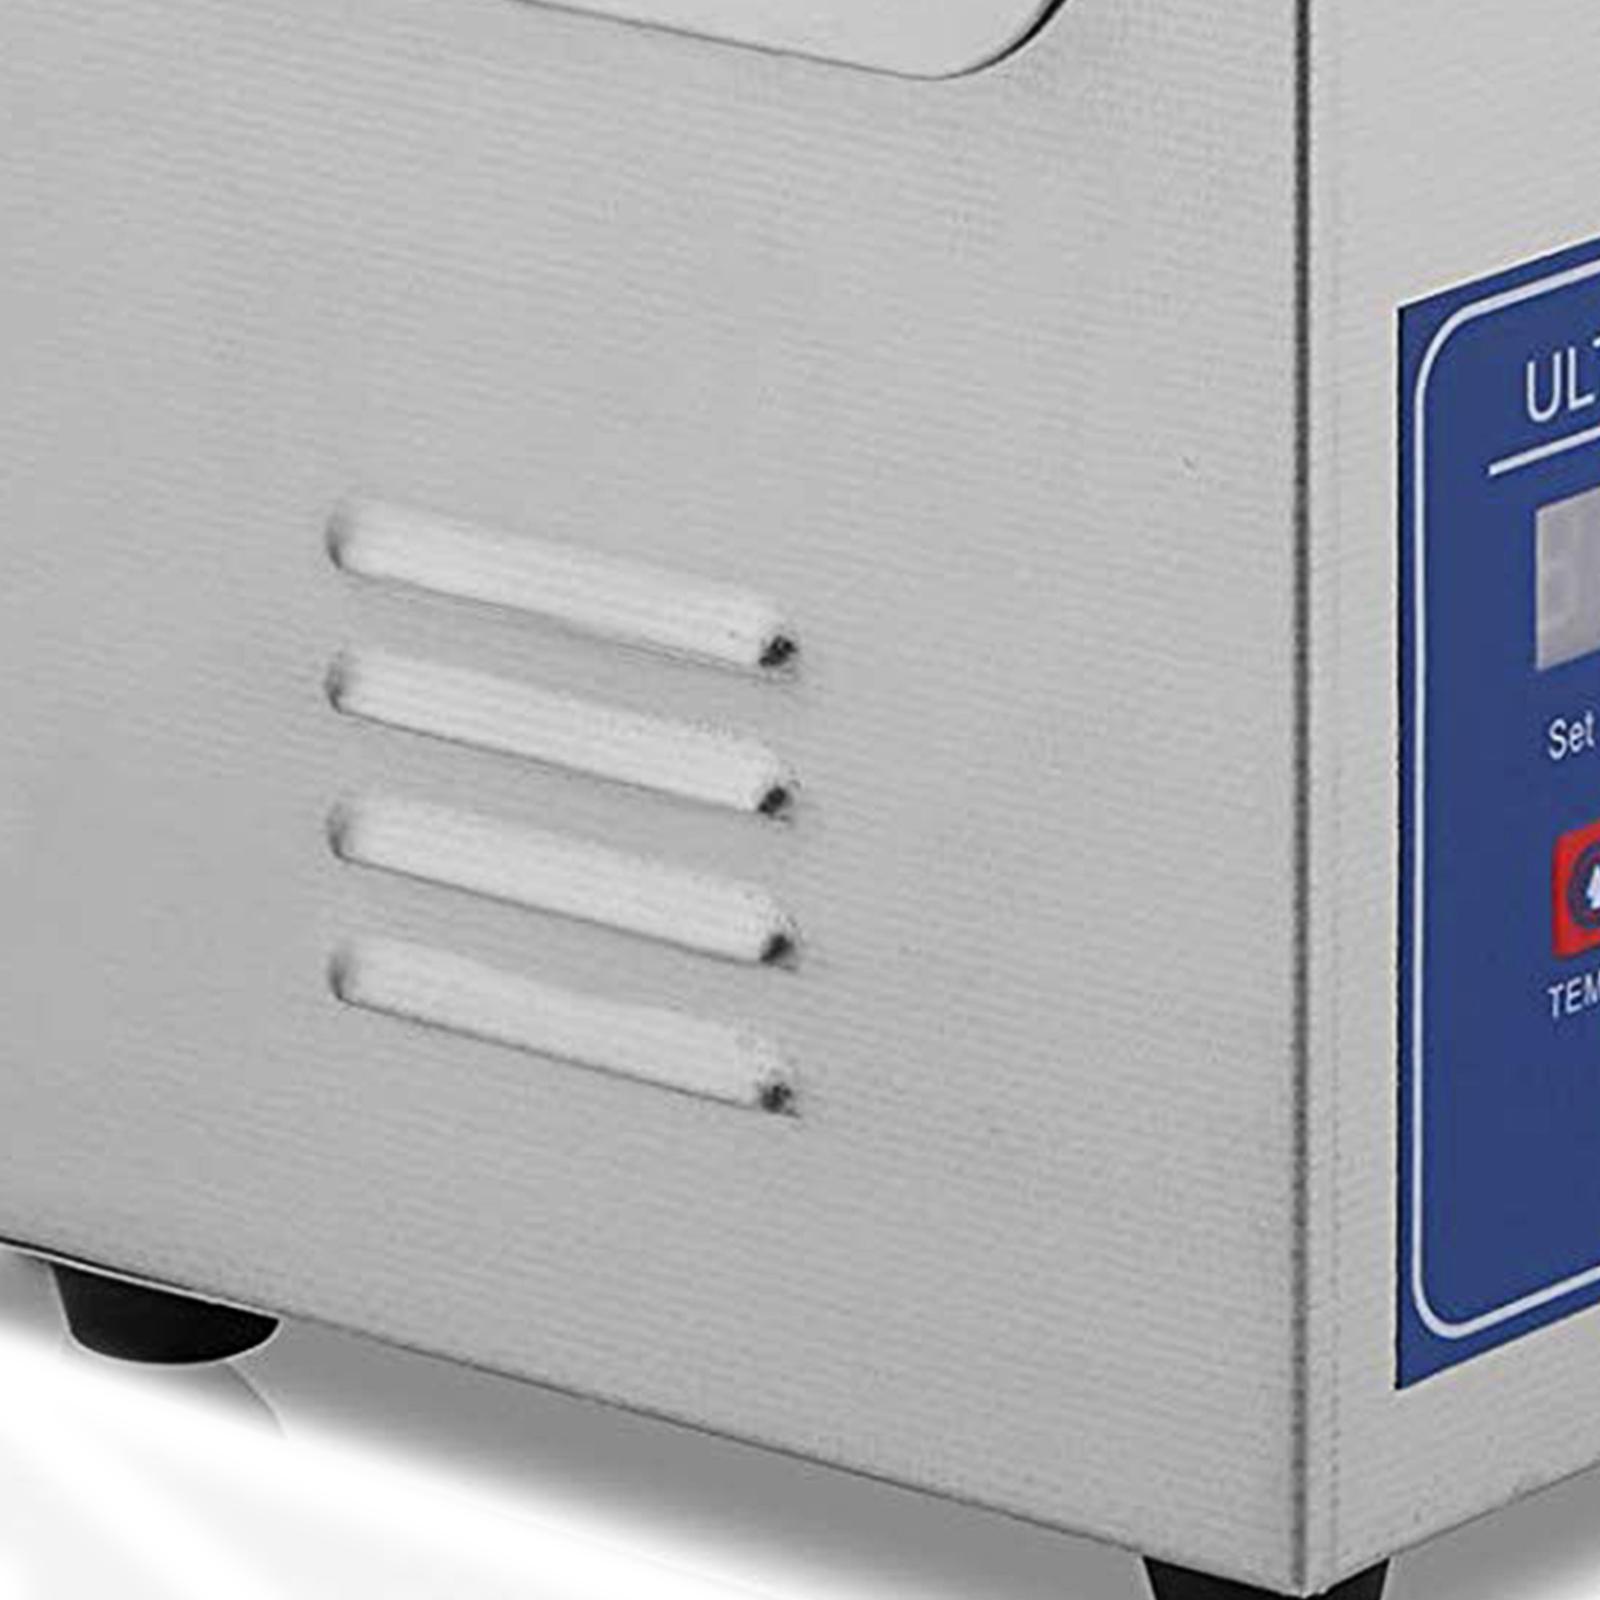 Vaschetta-Vasca-Ultrasuoni-Lavatrice-Pulitore-Ad-Ultrasuoni miniatura 32